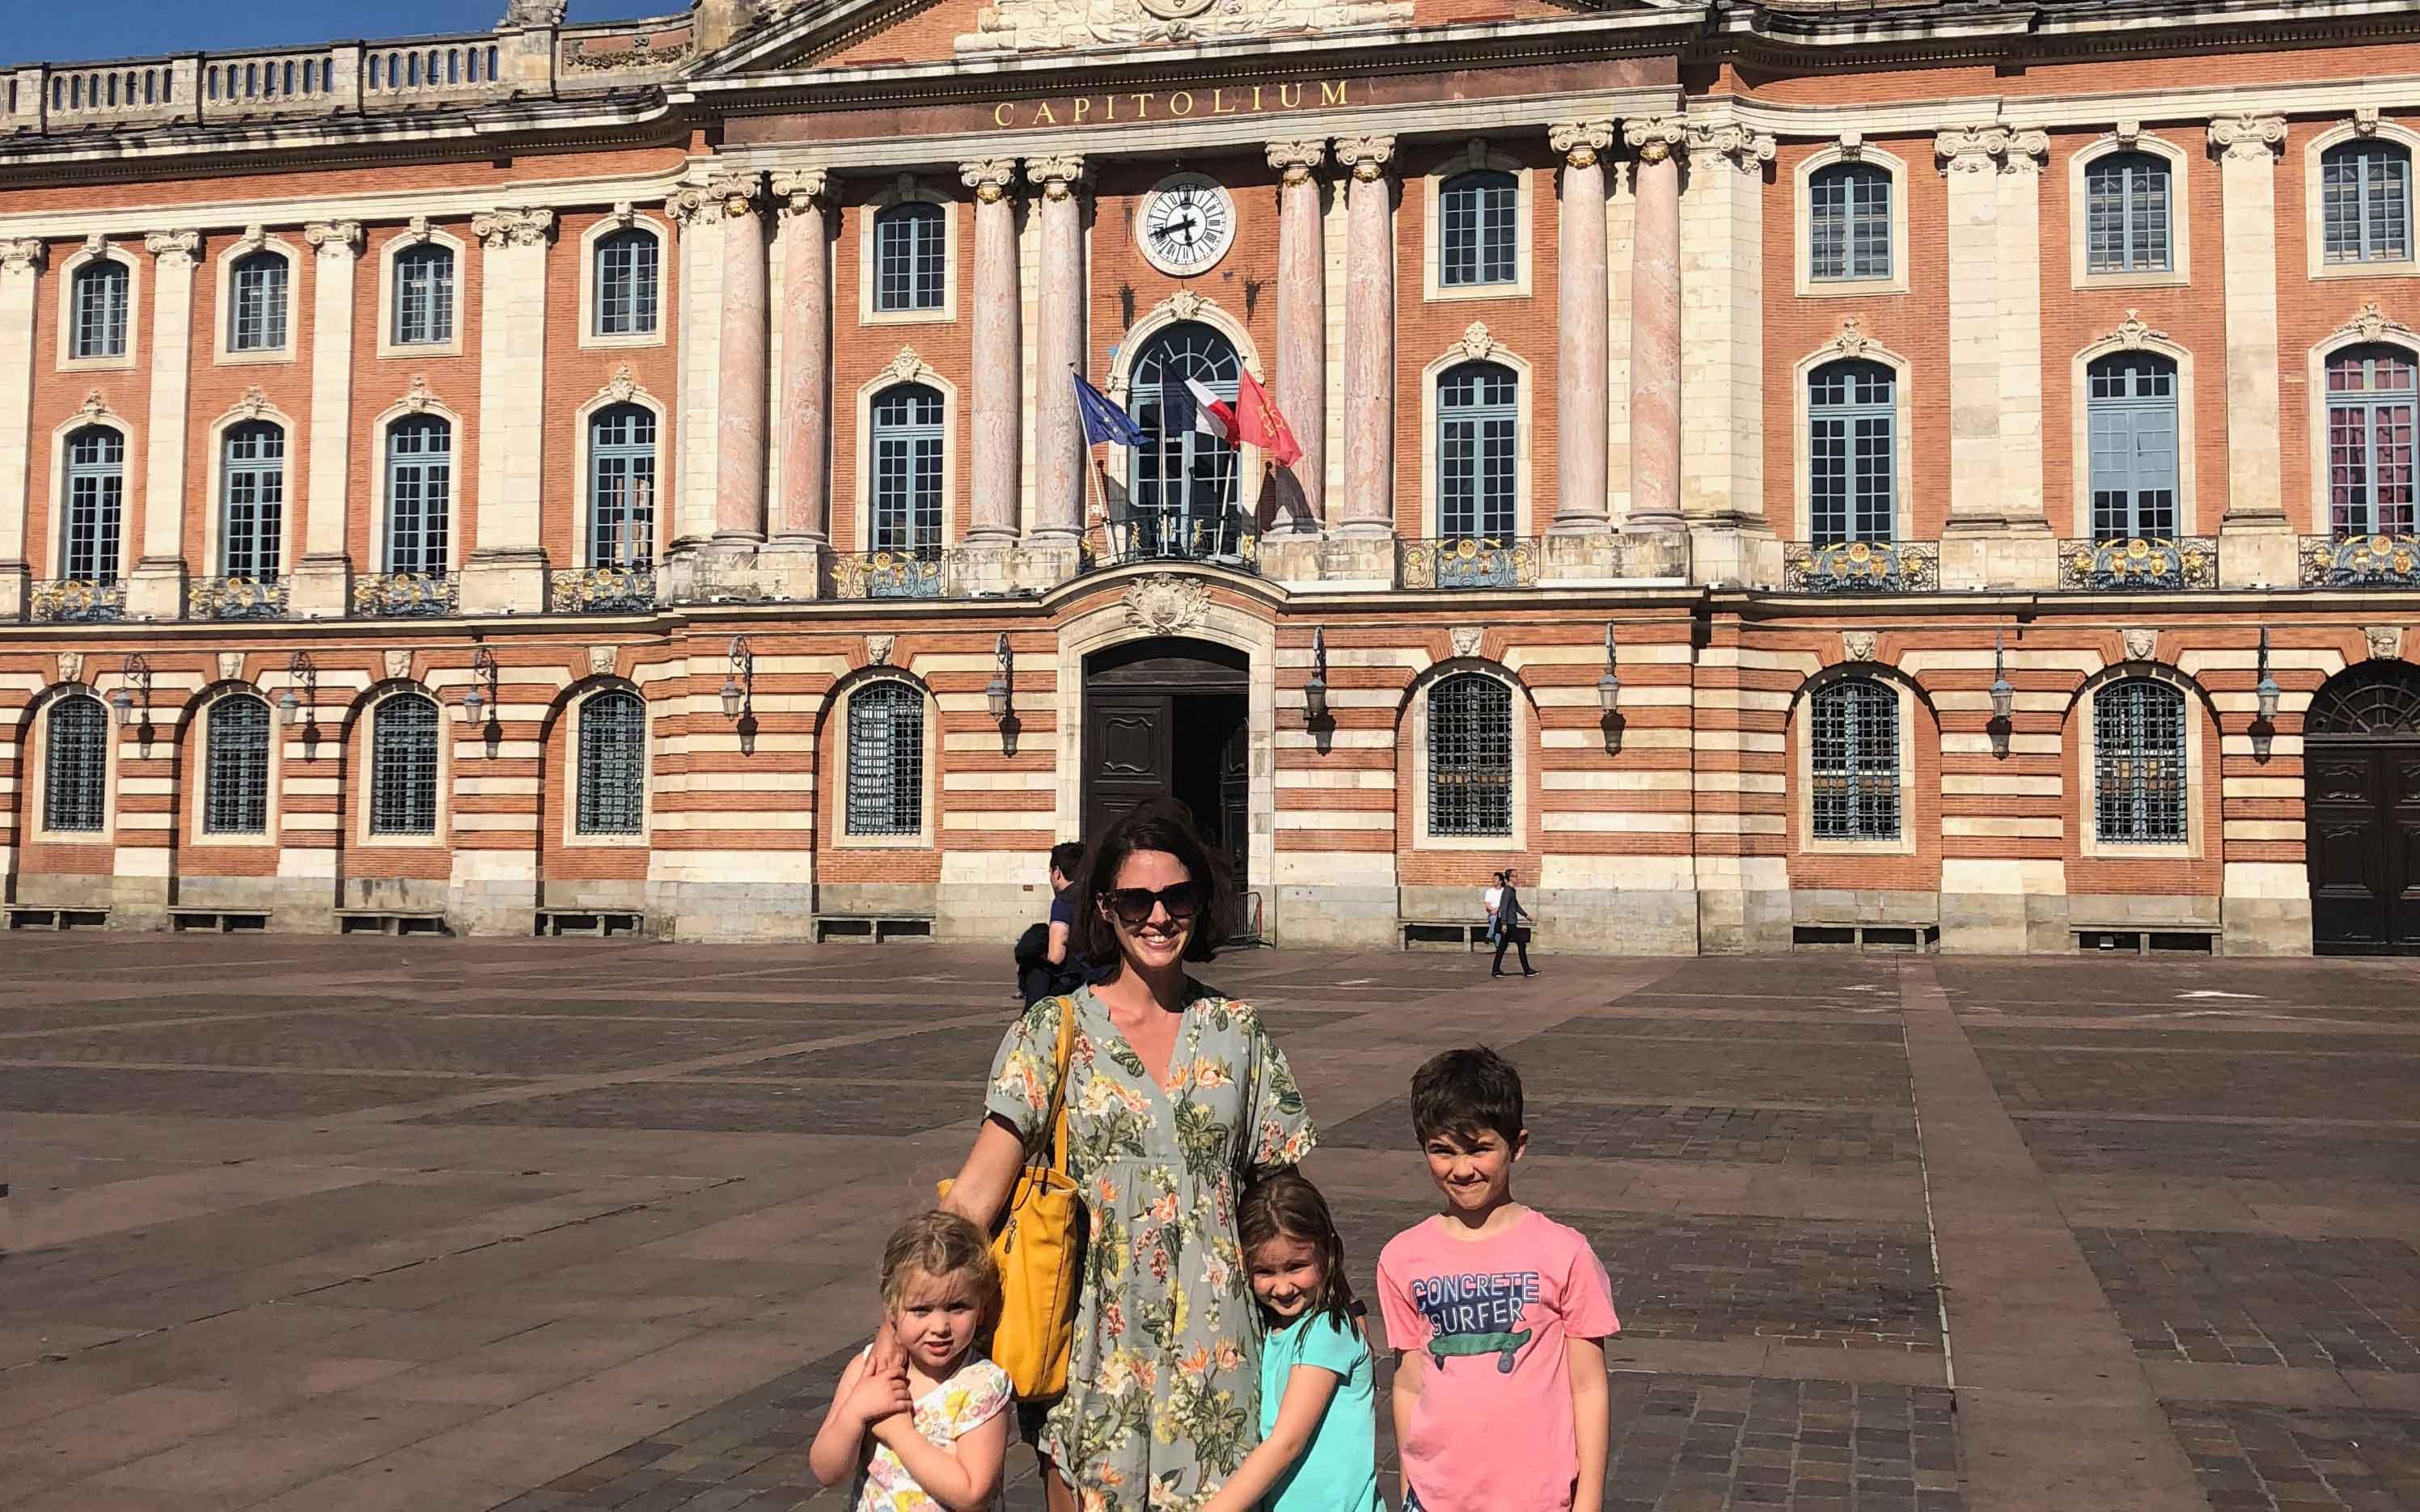 Brooke Wansey - Toulouse, France